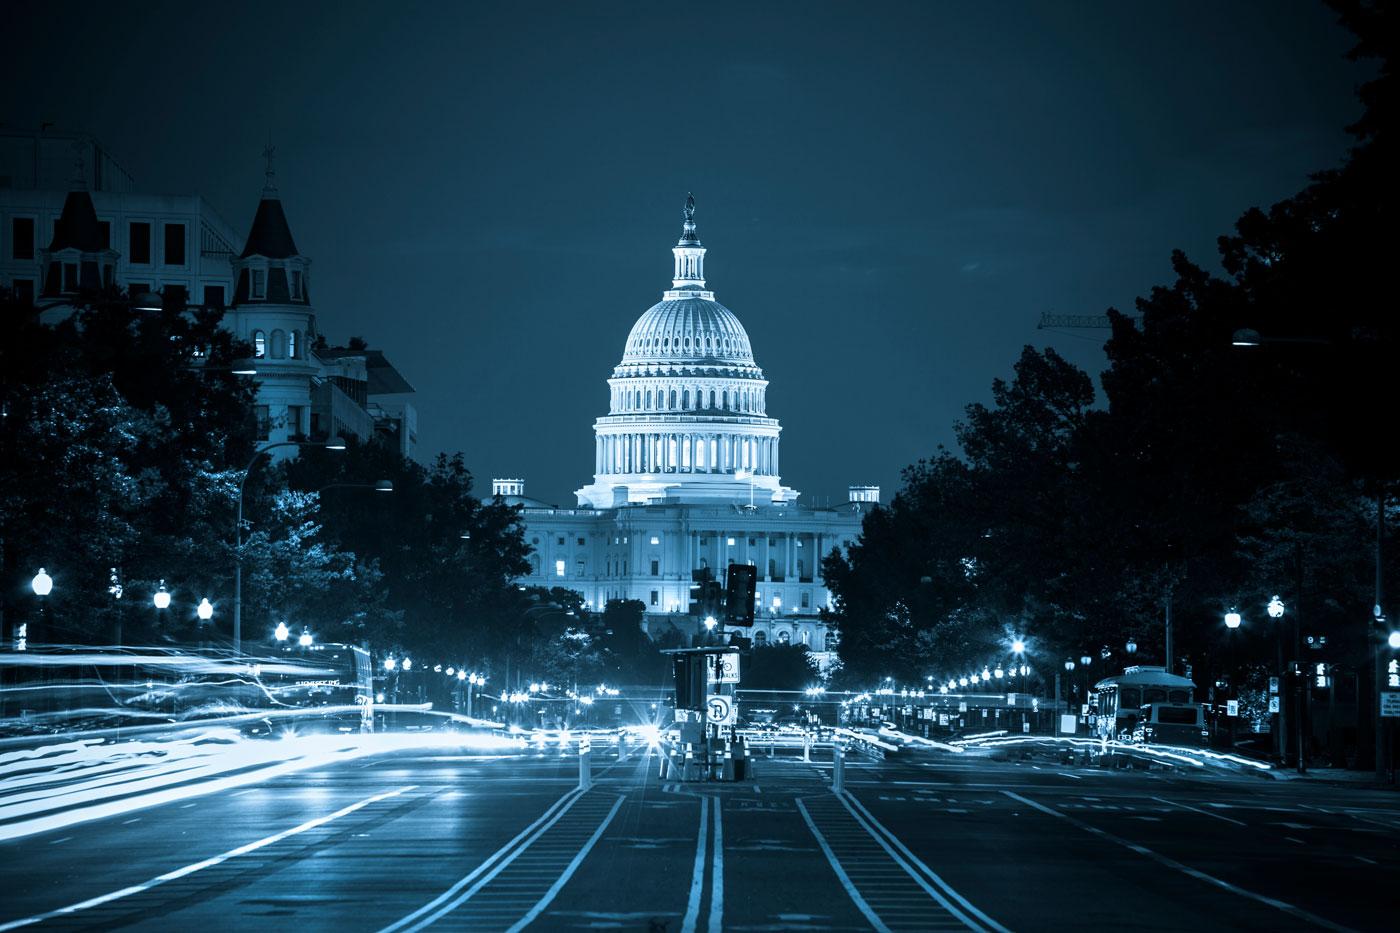 CapitolatNight.jpg